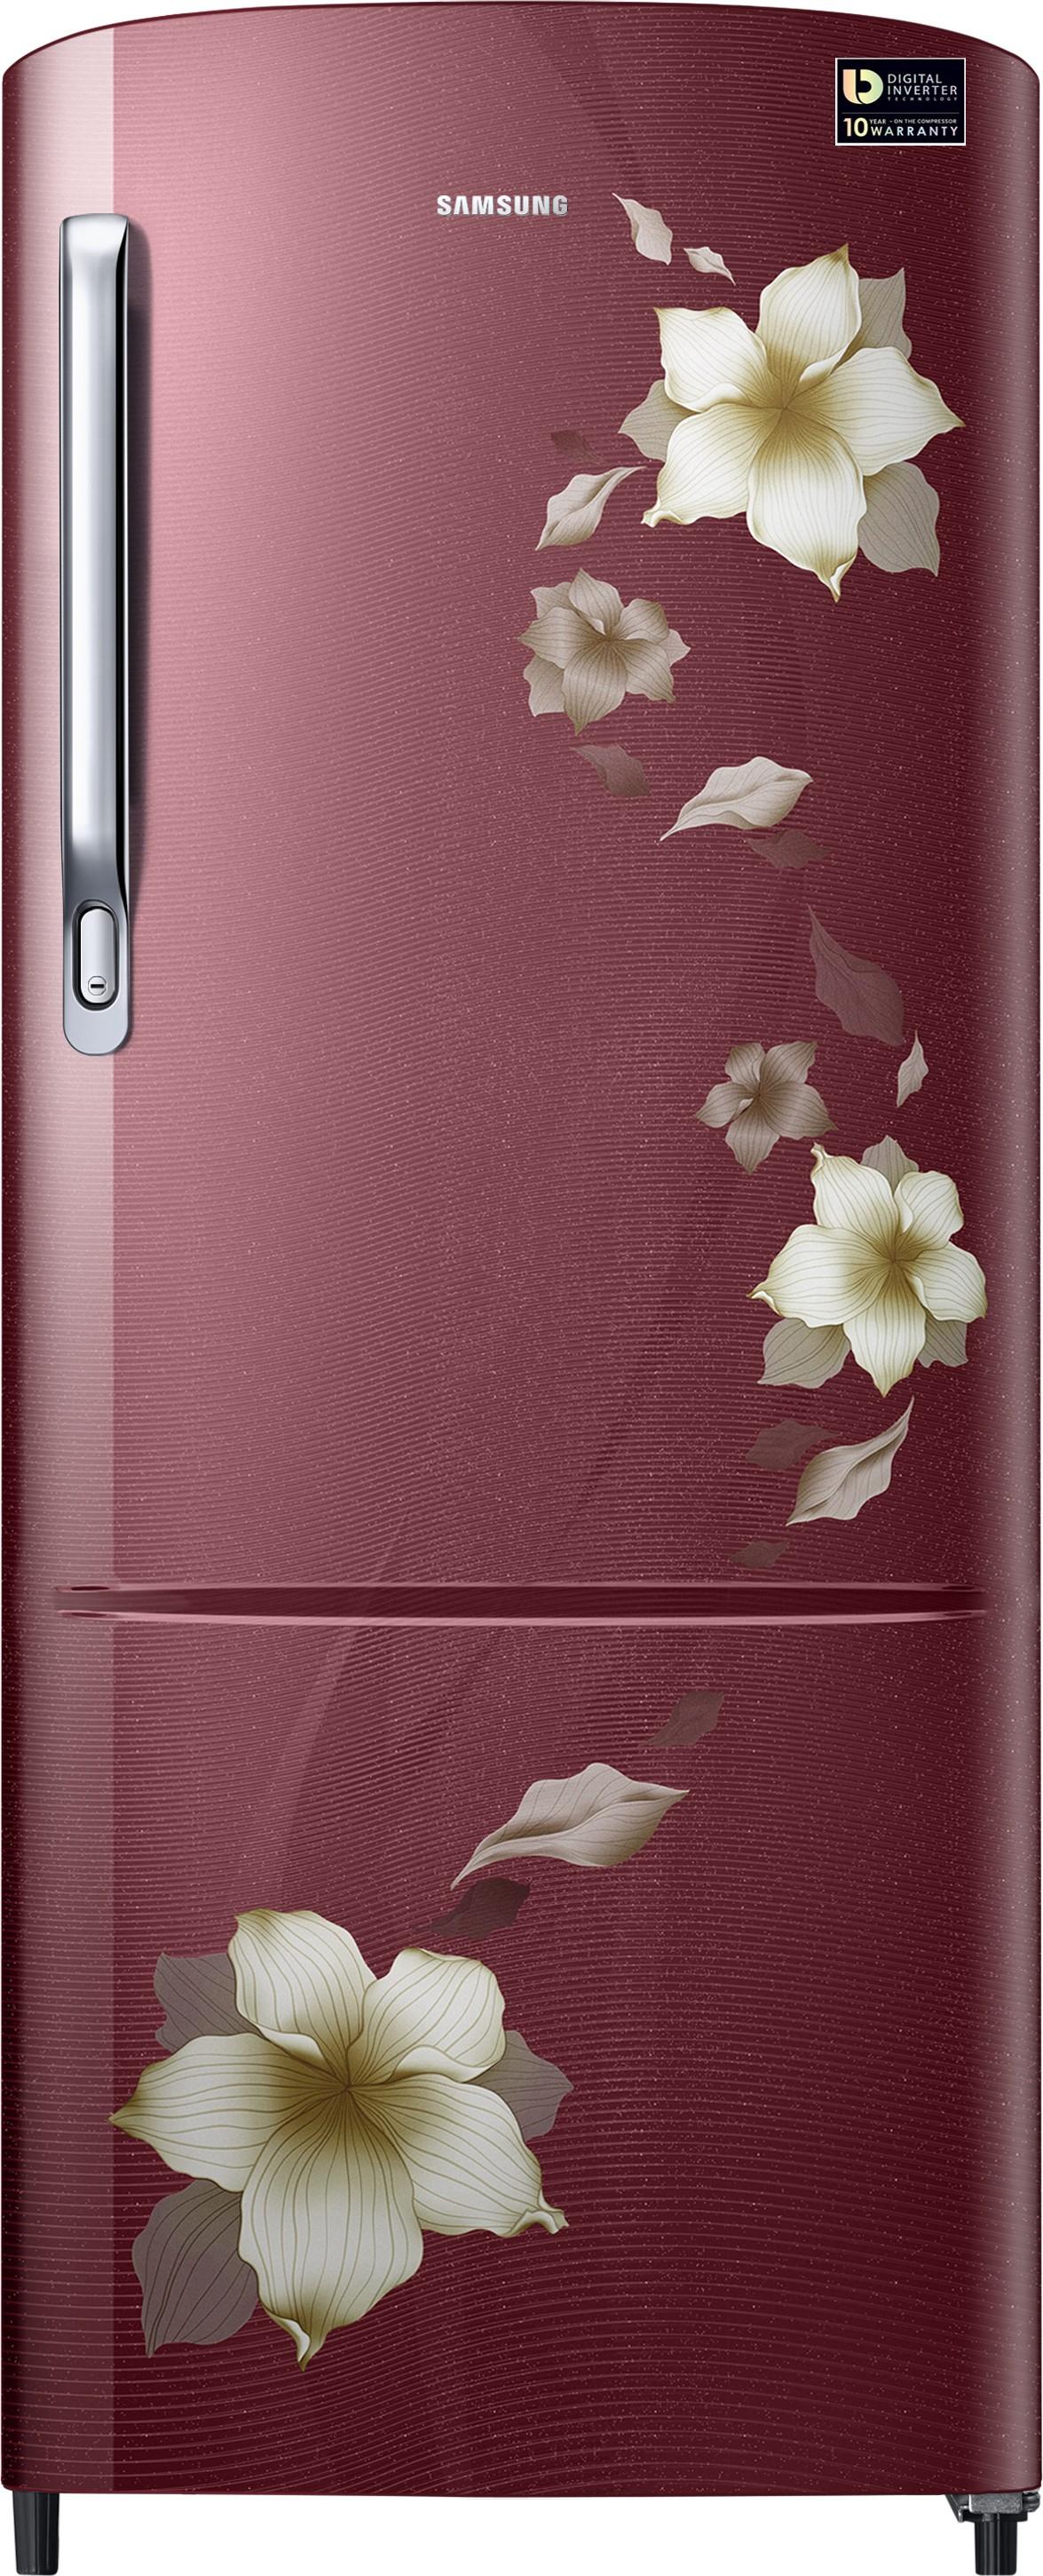 SAMSUNG 212 L Direct Cool Single Door Refrigerator(RR22M274YR2/NL, Star Flower Red, 2017) (Samsung) Tamil Nadu Buy Online